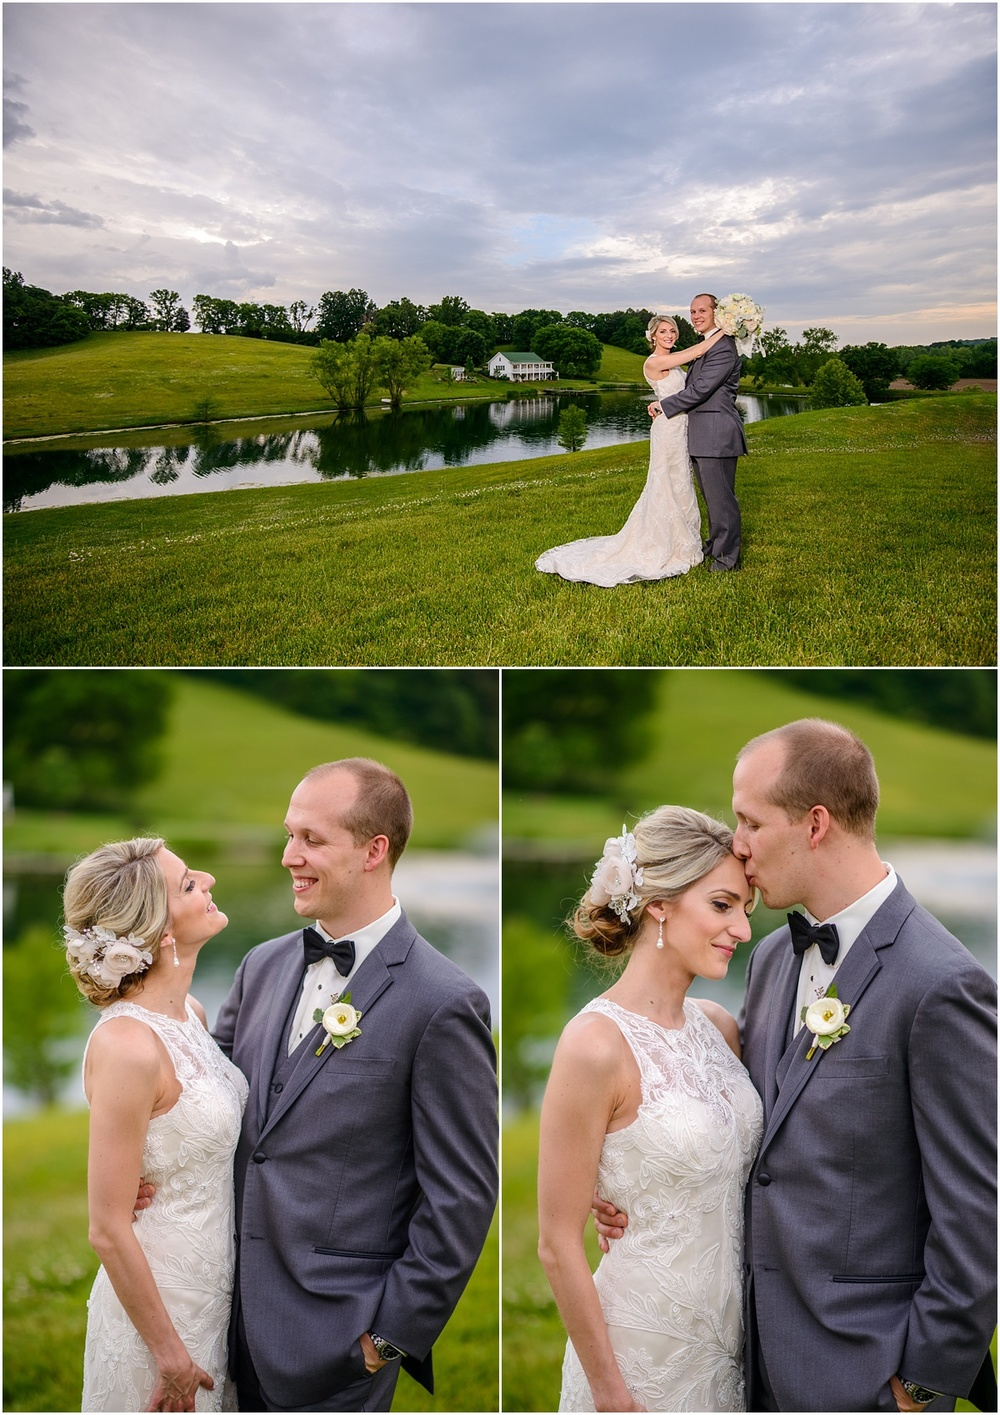 Greg Smit Photography Mint Springs Farm Nashville Tennessee wedding photographer_0396